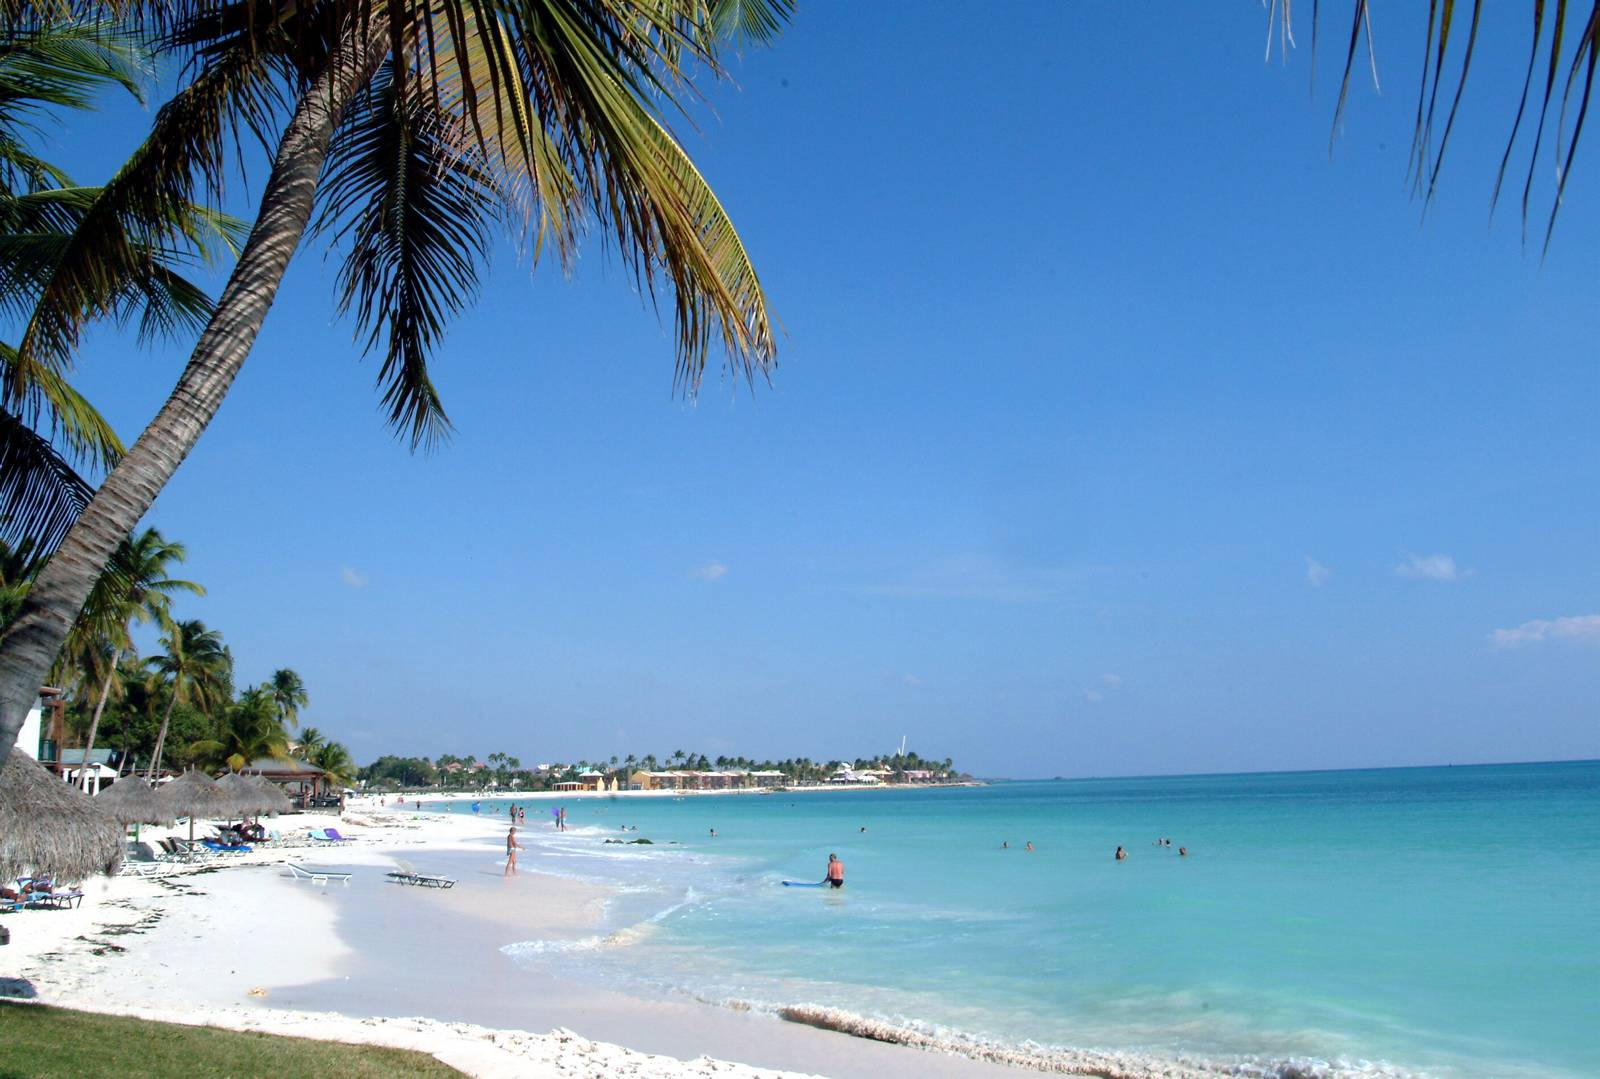 Aruba - beautiful Caribbean island | Flickr - Photo Sharing!